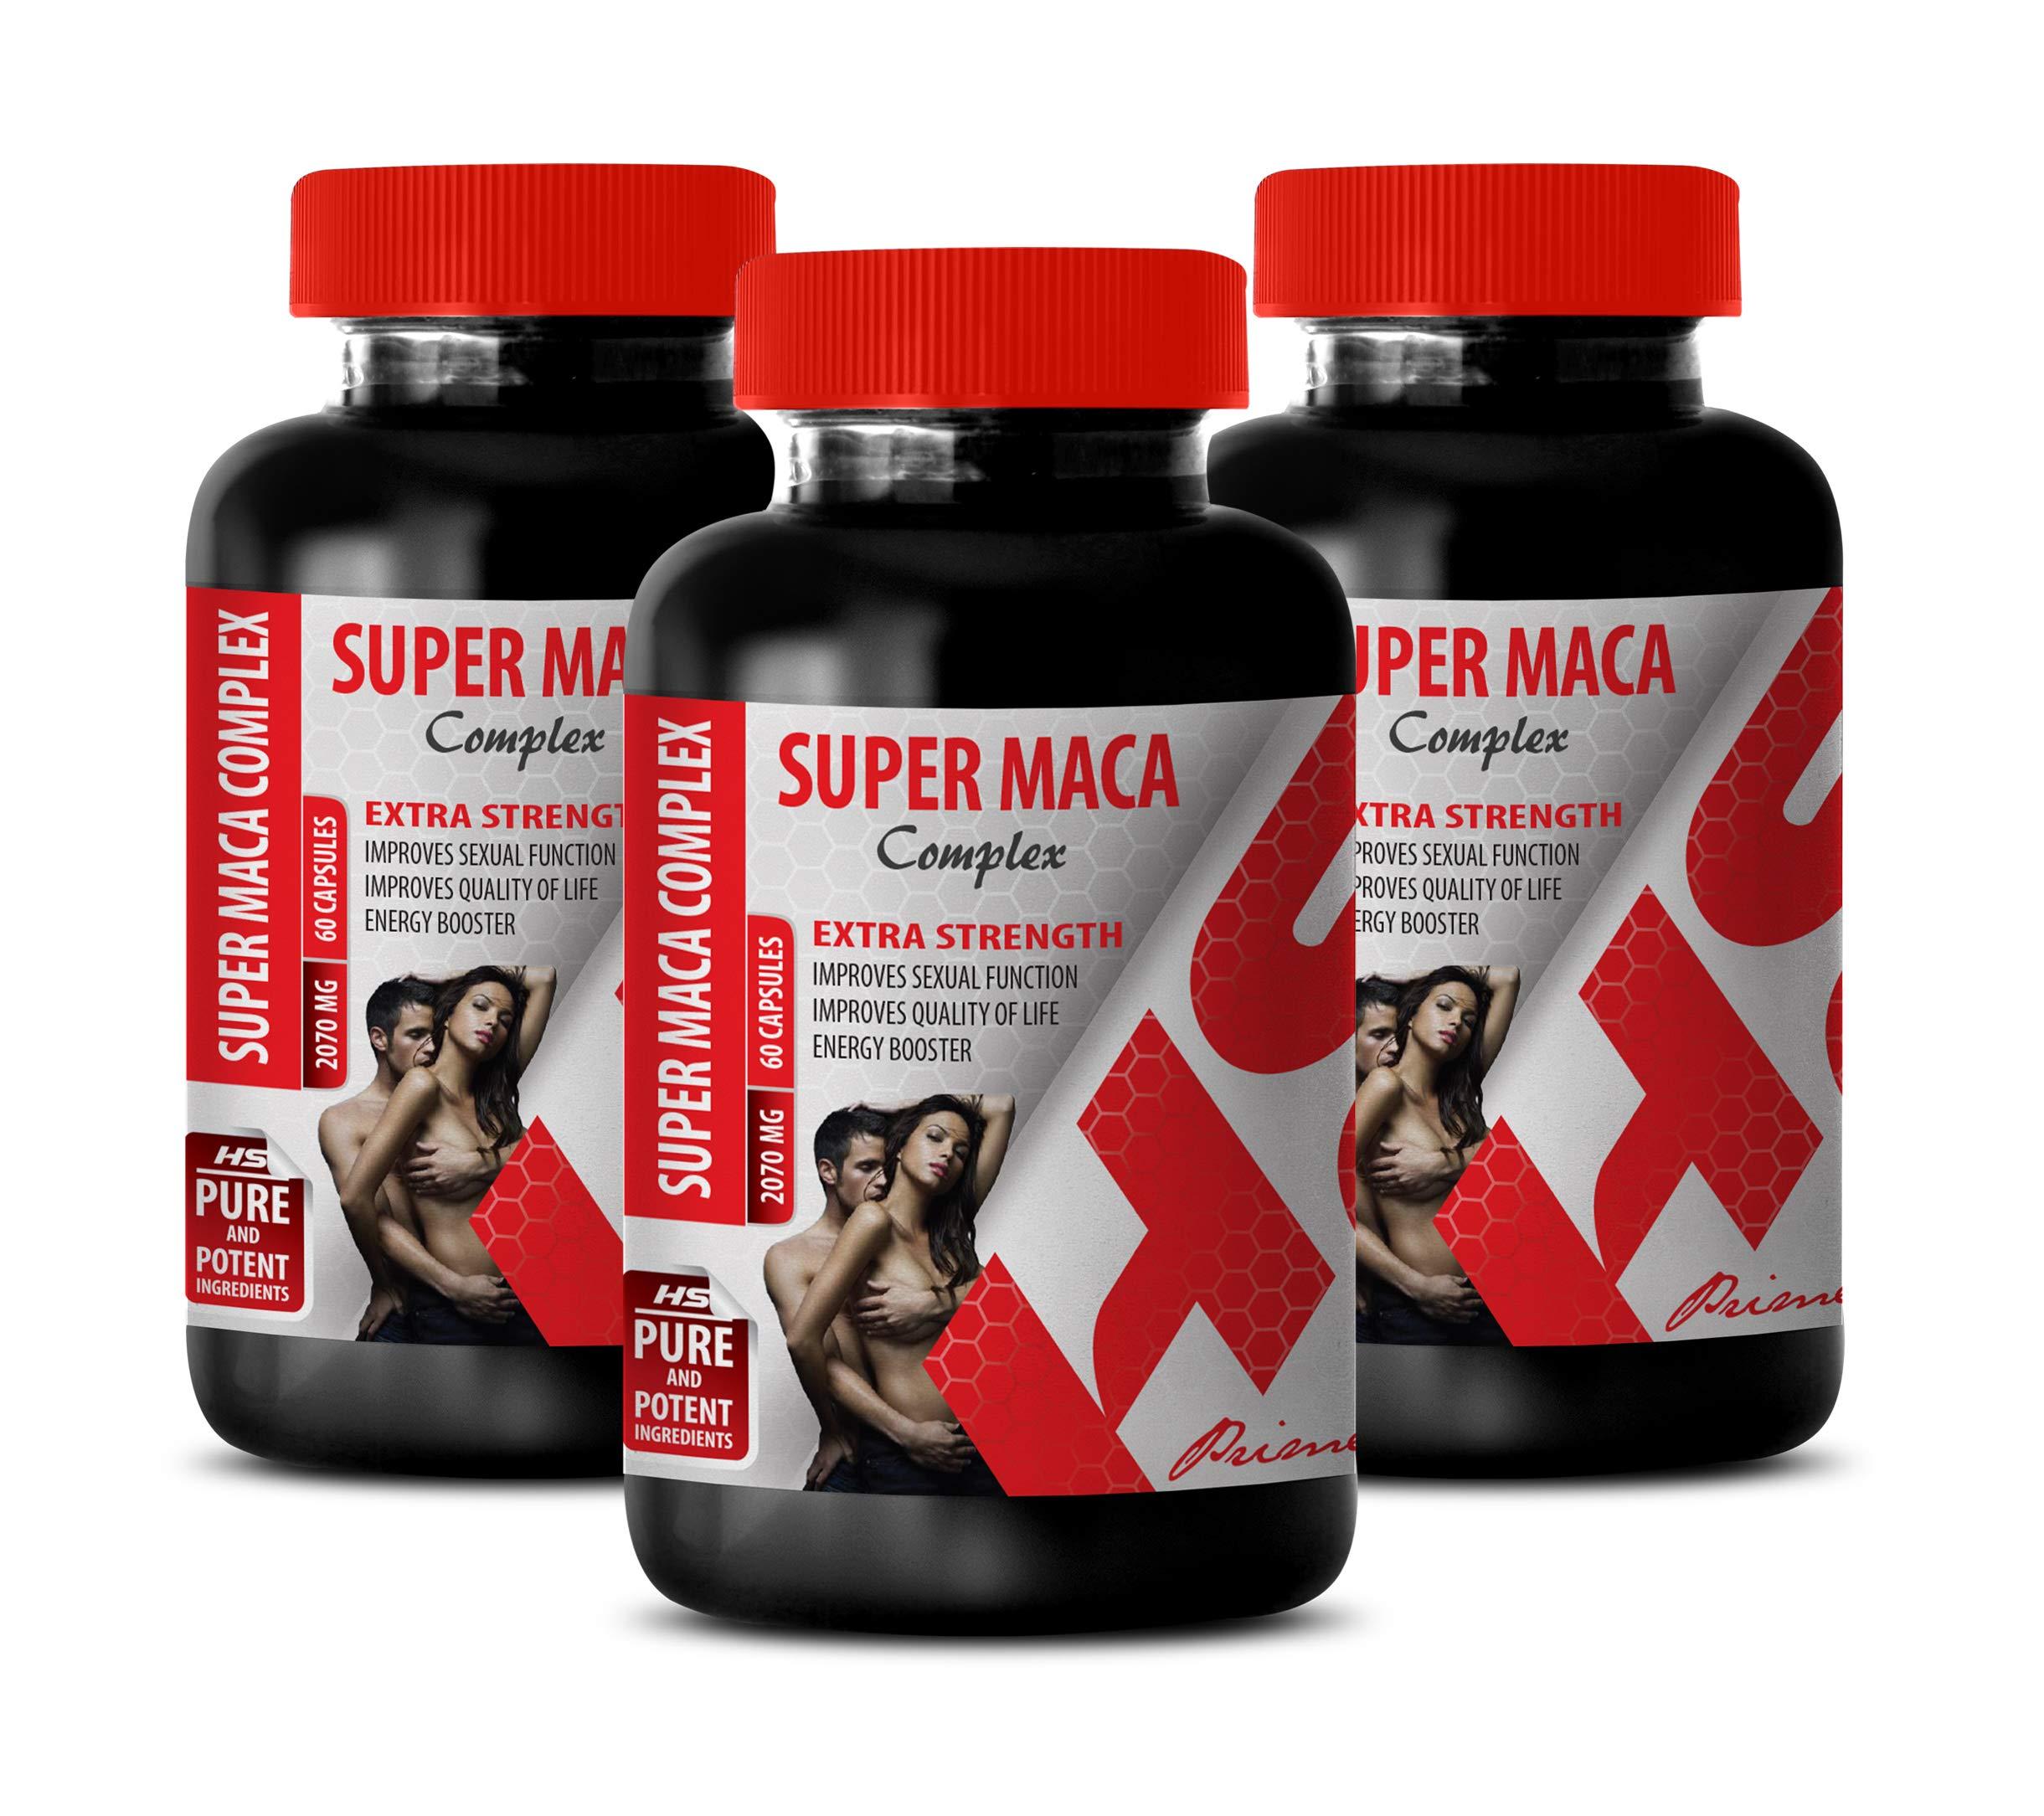 libido Supplements for Men - Super MACA Complex 2070 Mg - Extra Strength - l-arginine and yohimbine - 3 Bottles 180 Capsules